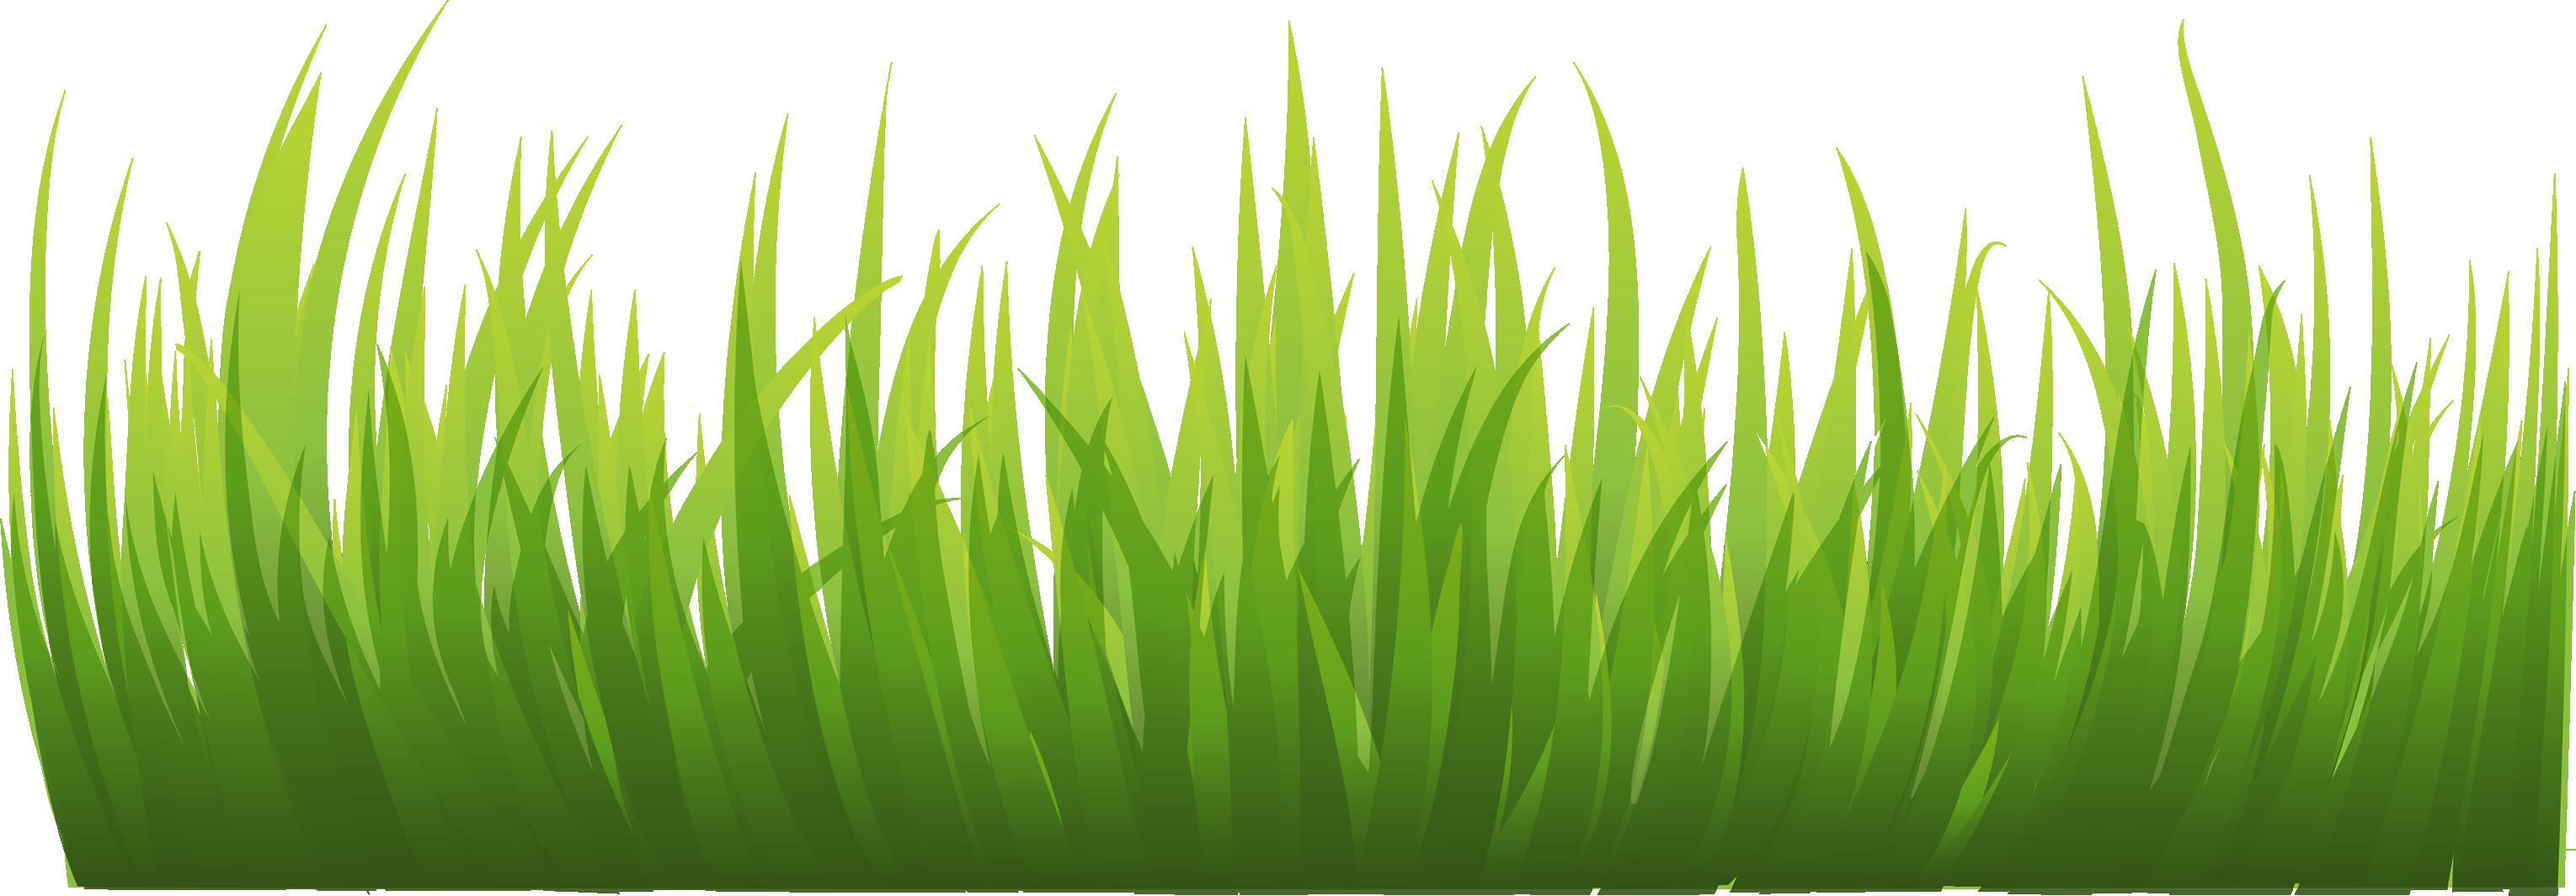 Grass HD PNG - 119868